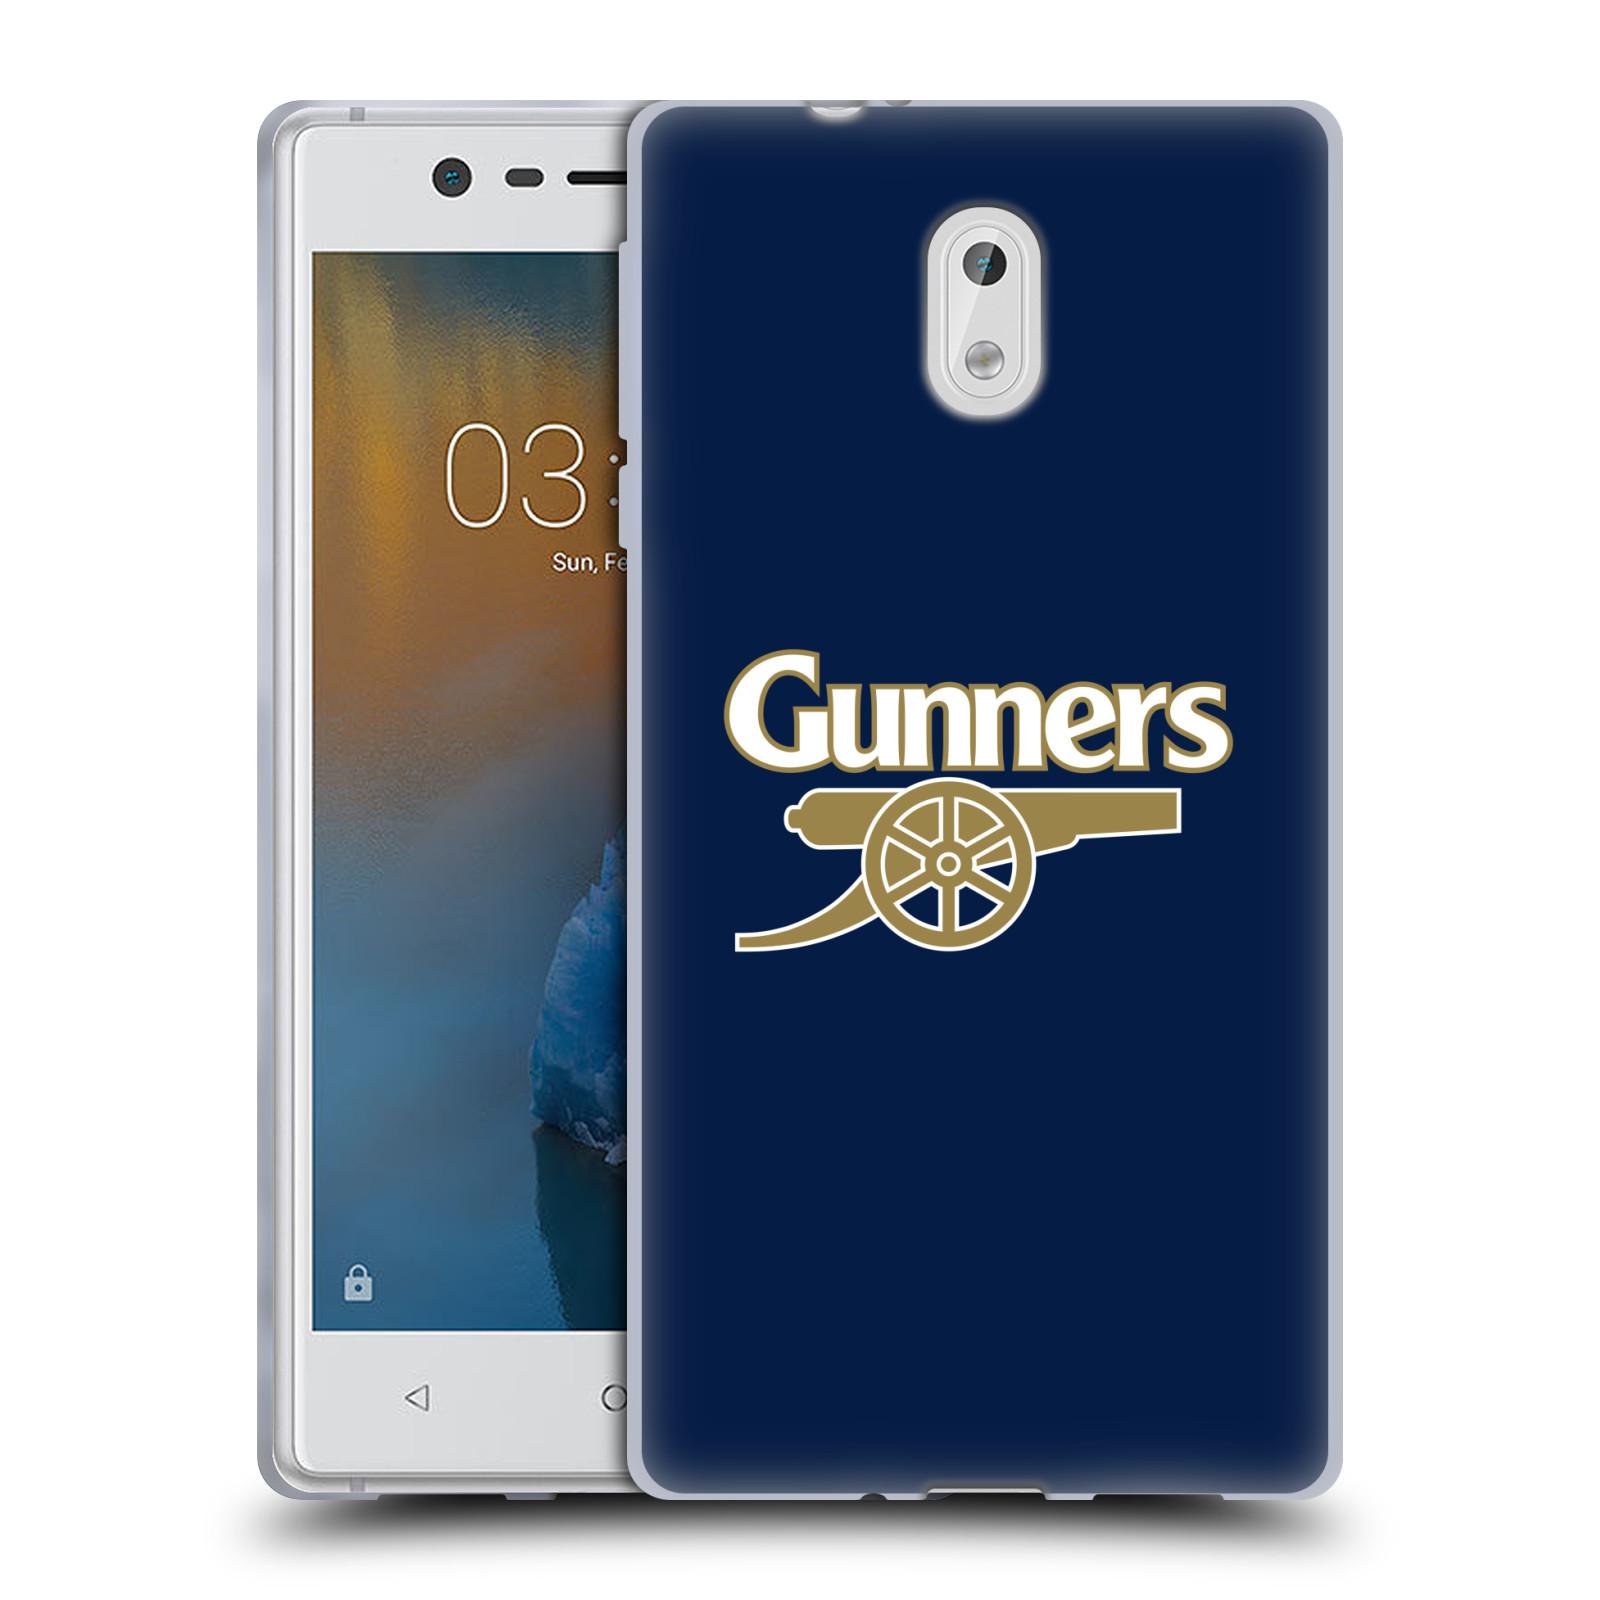 Silikonové pouzdro na mobil Nokia 3 Head Case - Arsenal FC - Gunners